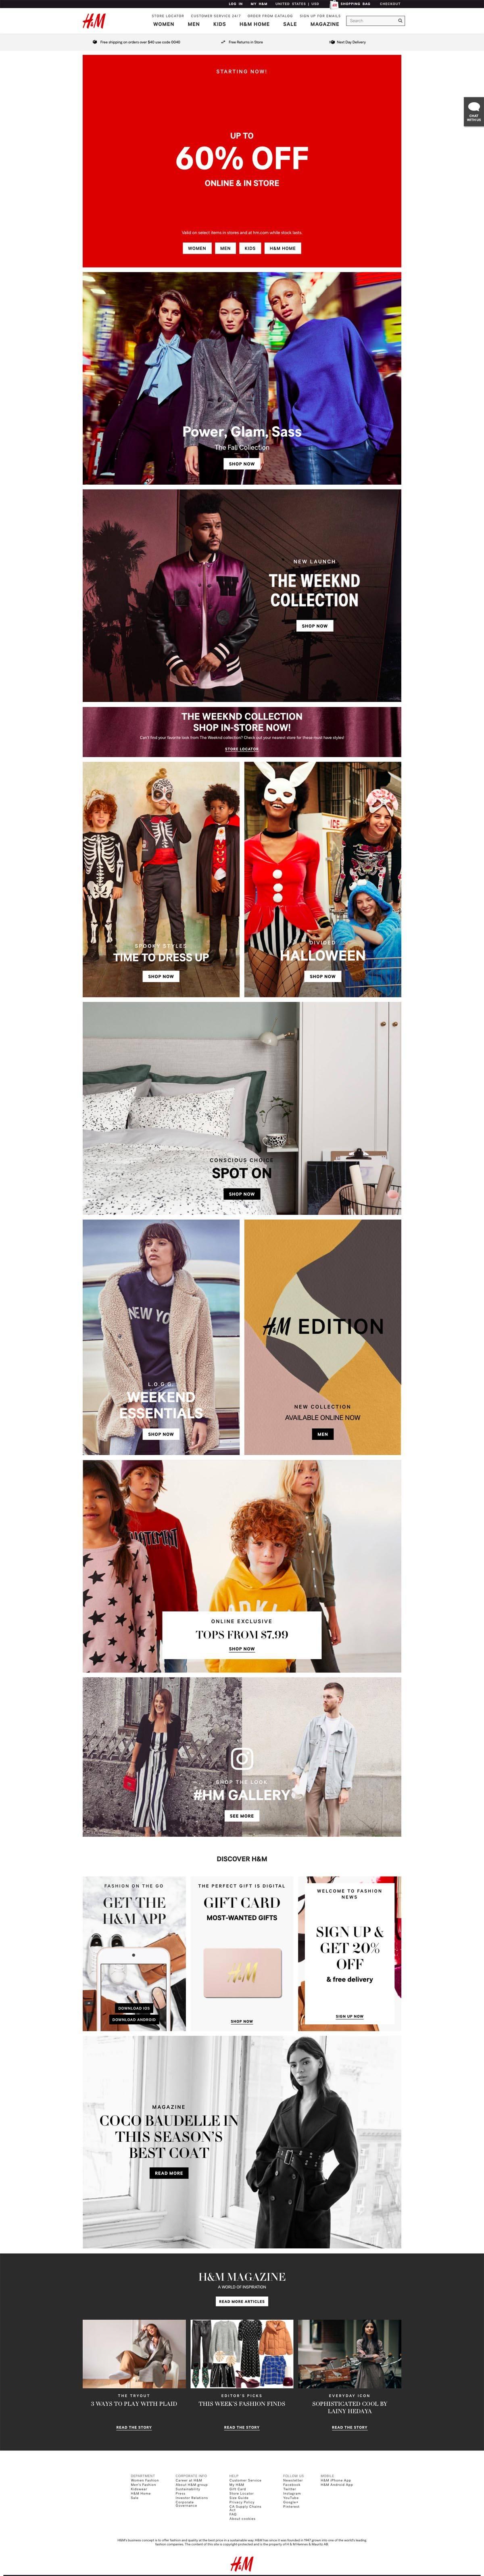 eCommerce website: H&M